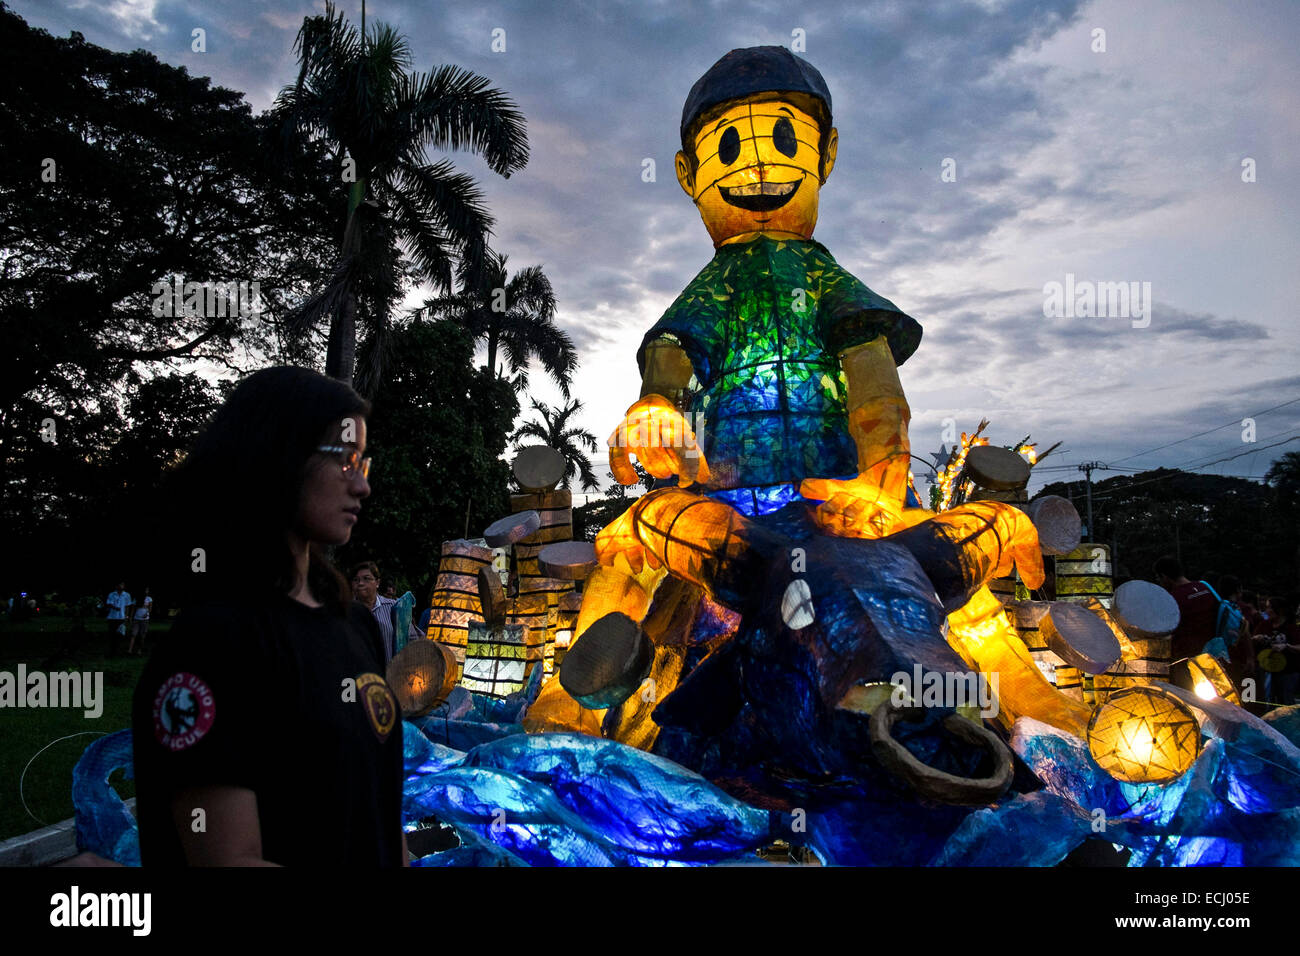 Penpen de Sarapen is a popular Filipino children folk song